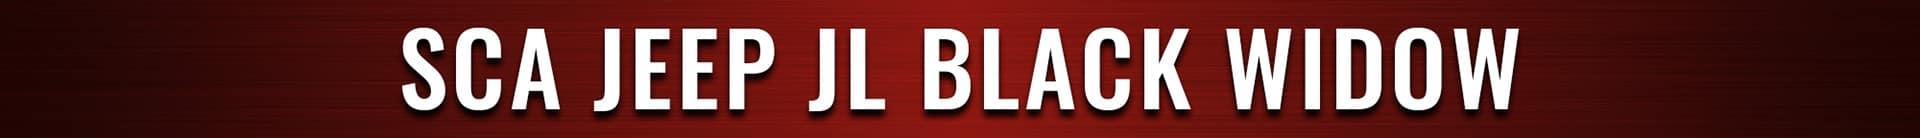 SCA JEEP JL Black Widow Banner